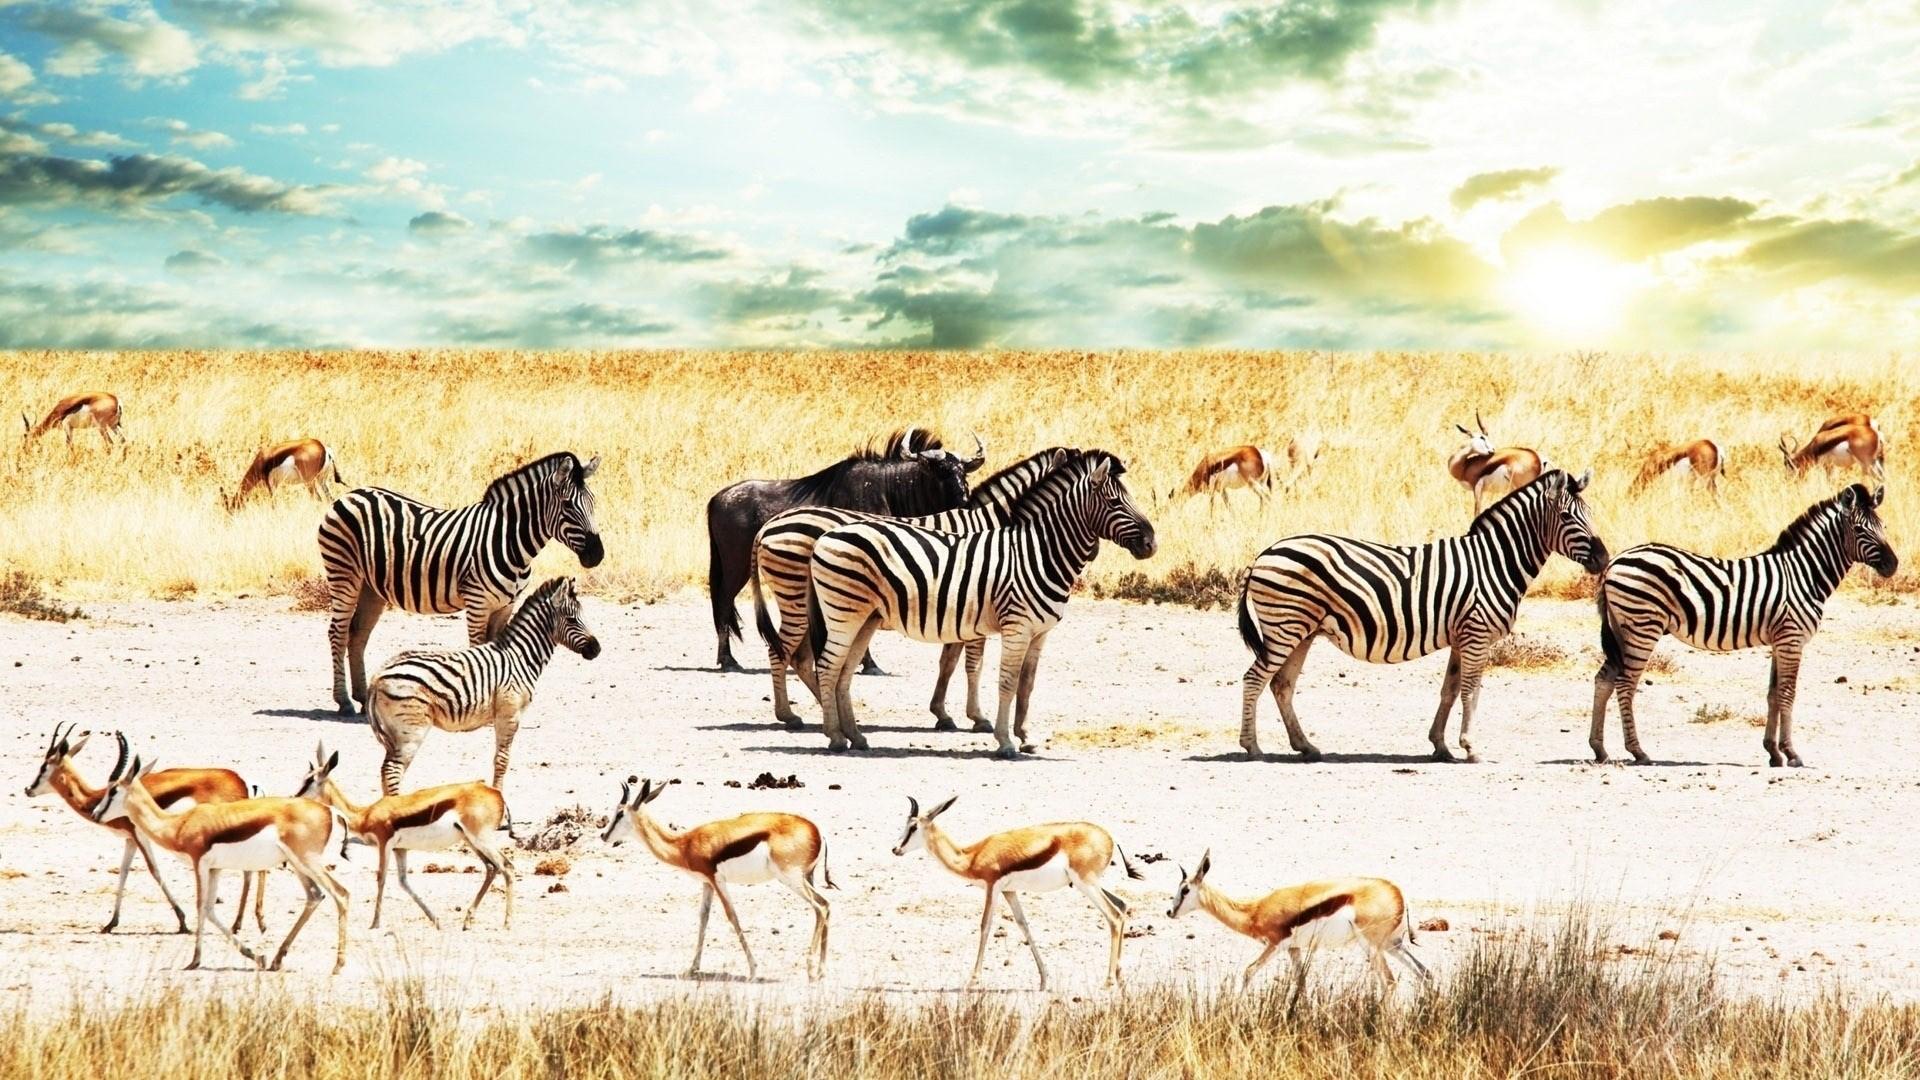 buffalo-zebra-africa-sky-savannah-antelope-backgrounds-1920x1080-wallpaper-wp3403549